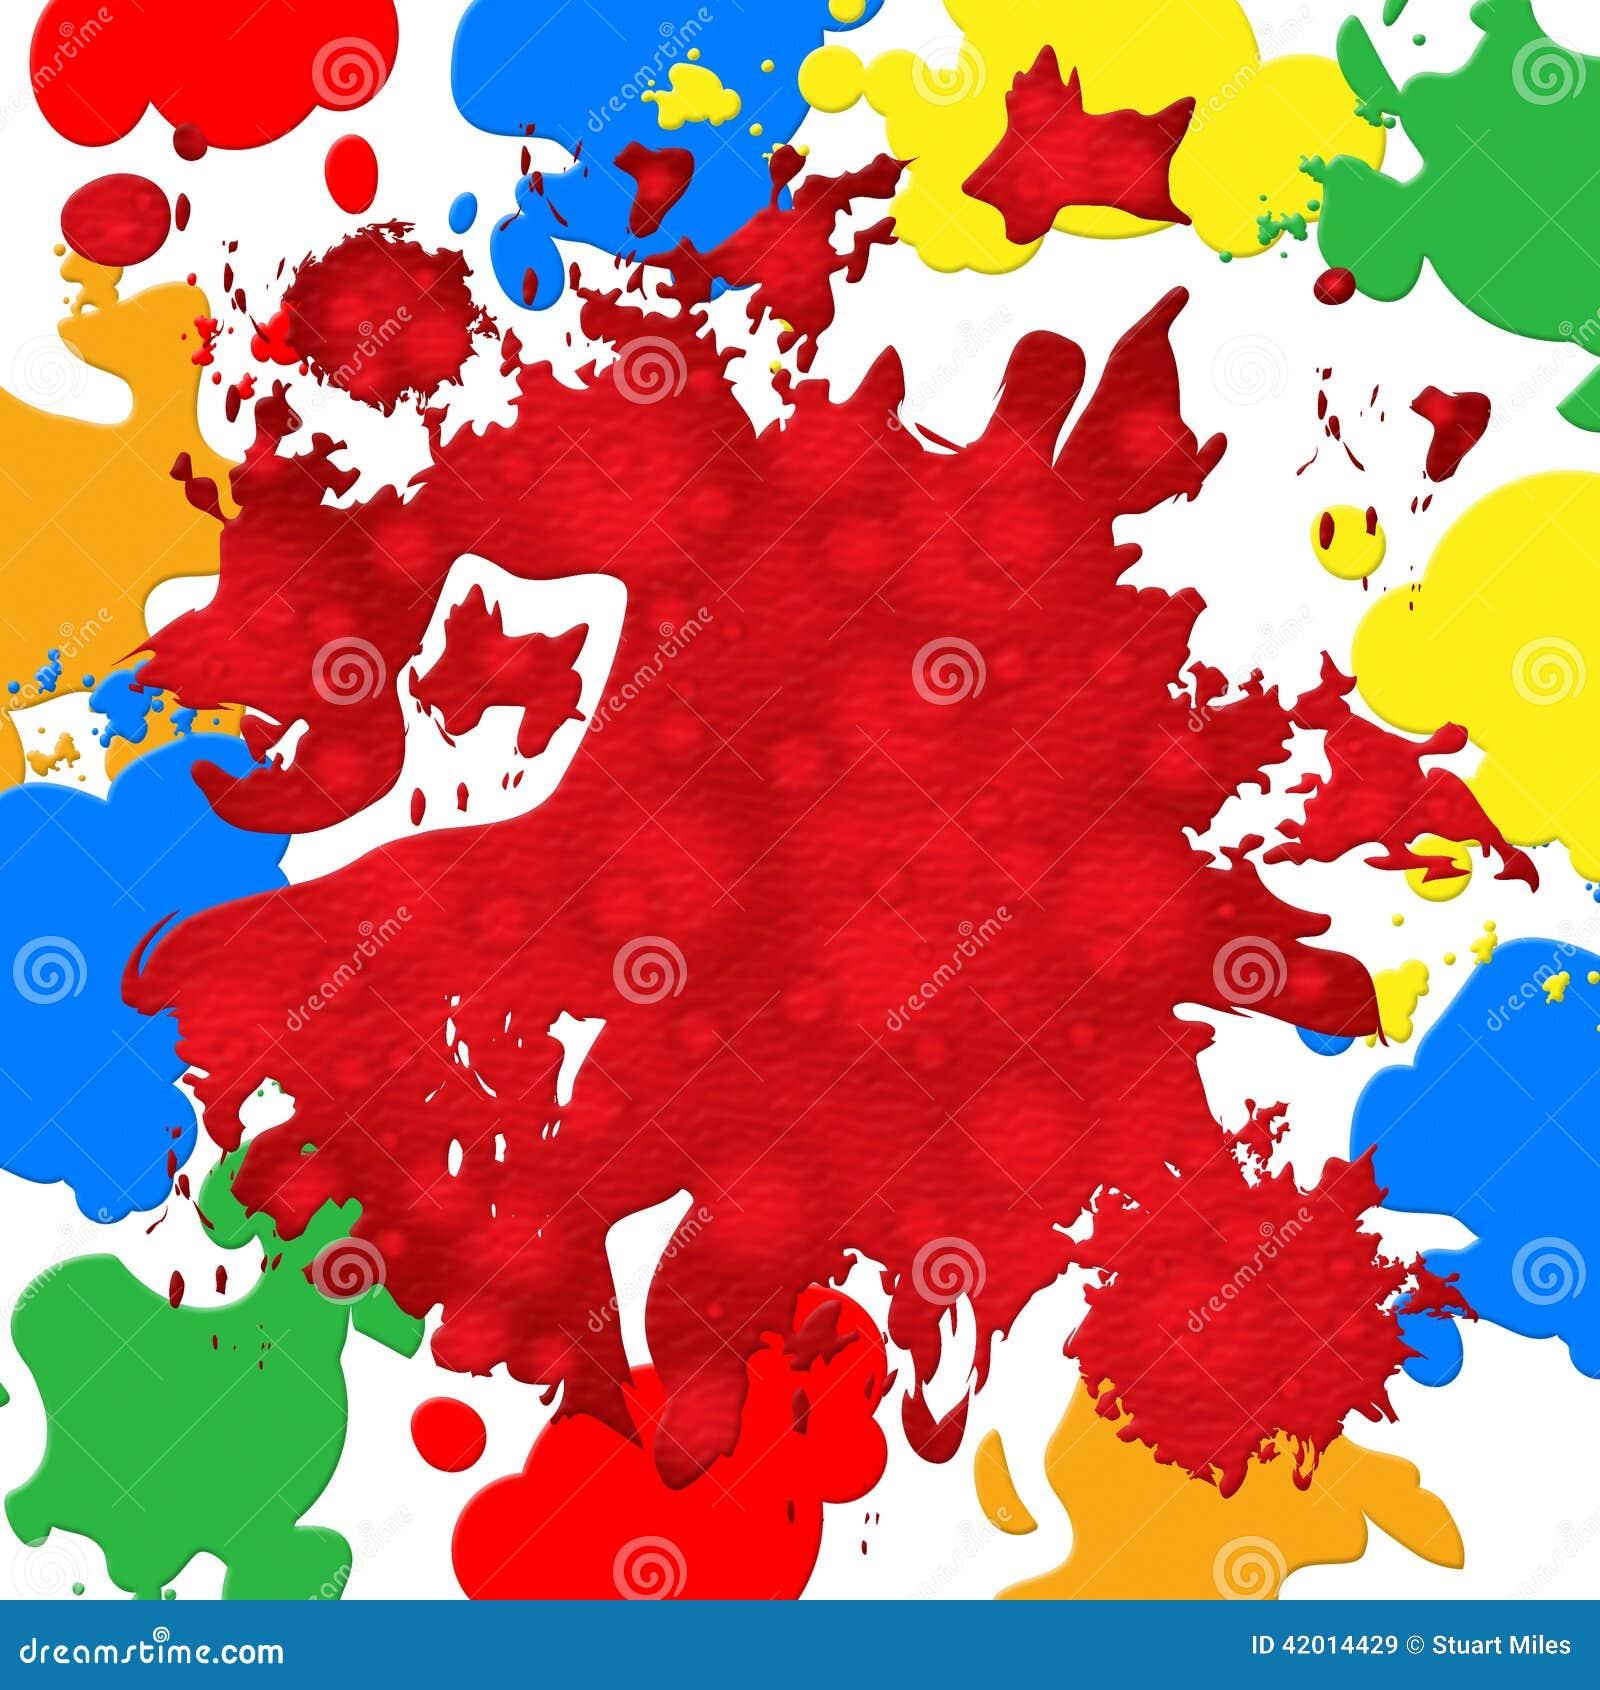 paint color shows backdrop blot and vibrant stock